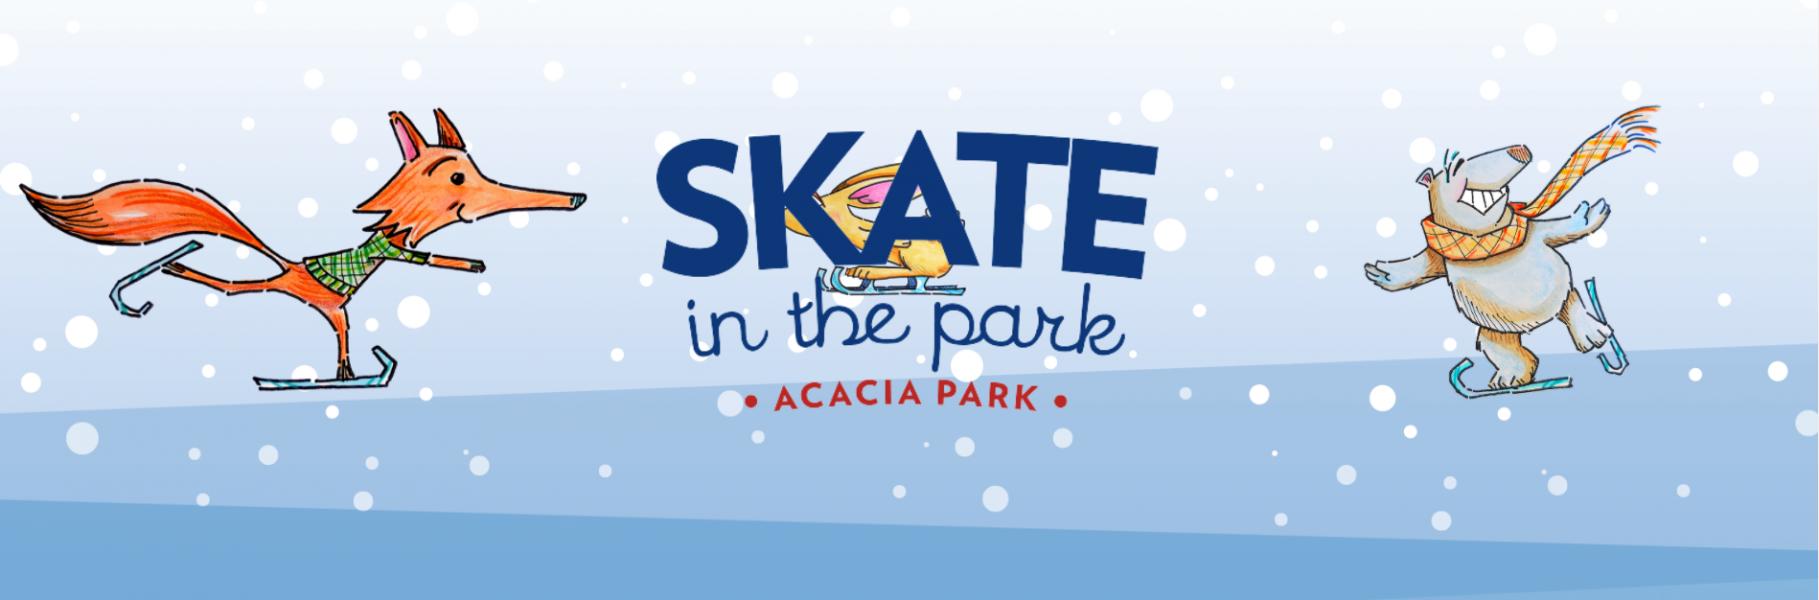 Skate in the Park presented by Downtown Partnership of Colorado Springs at Acacia Park, Colorado Springs CO